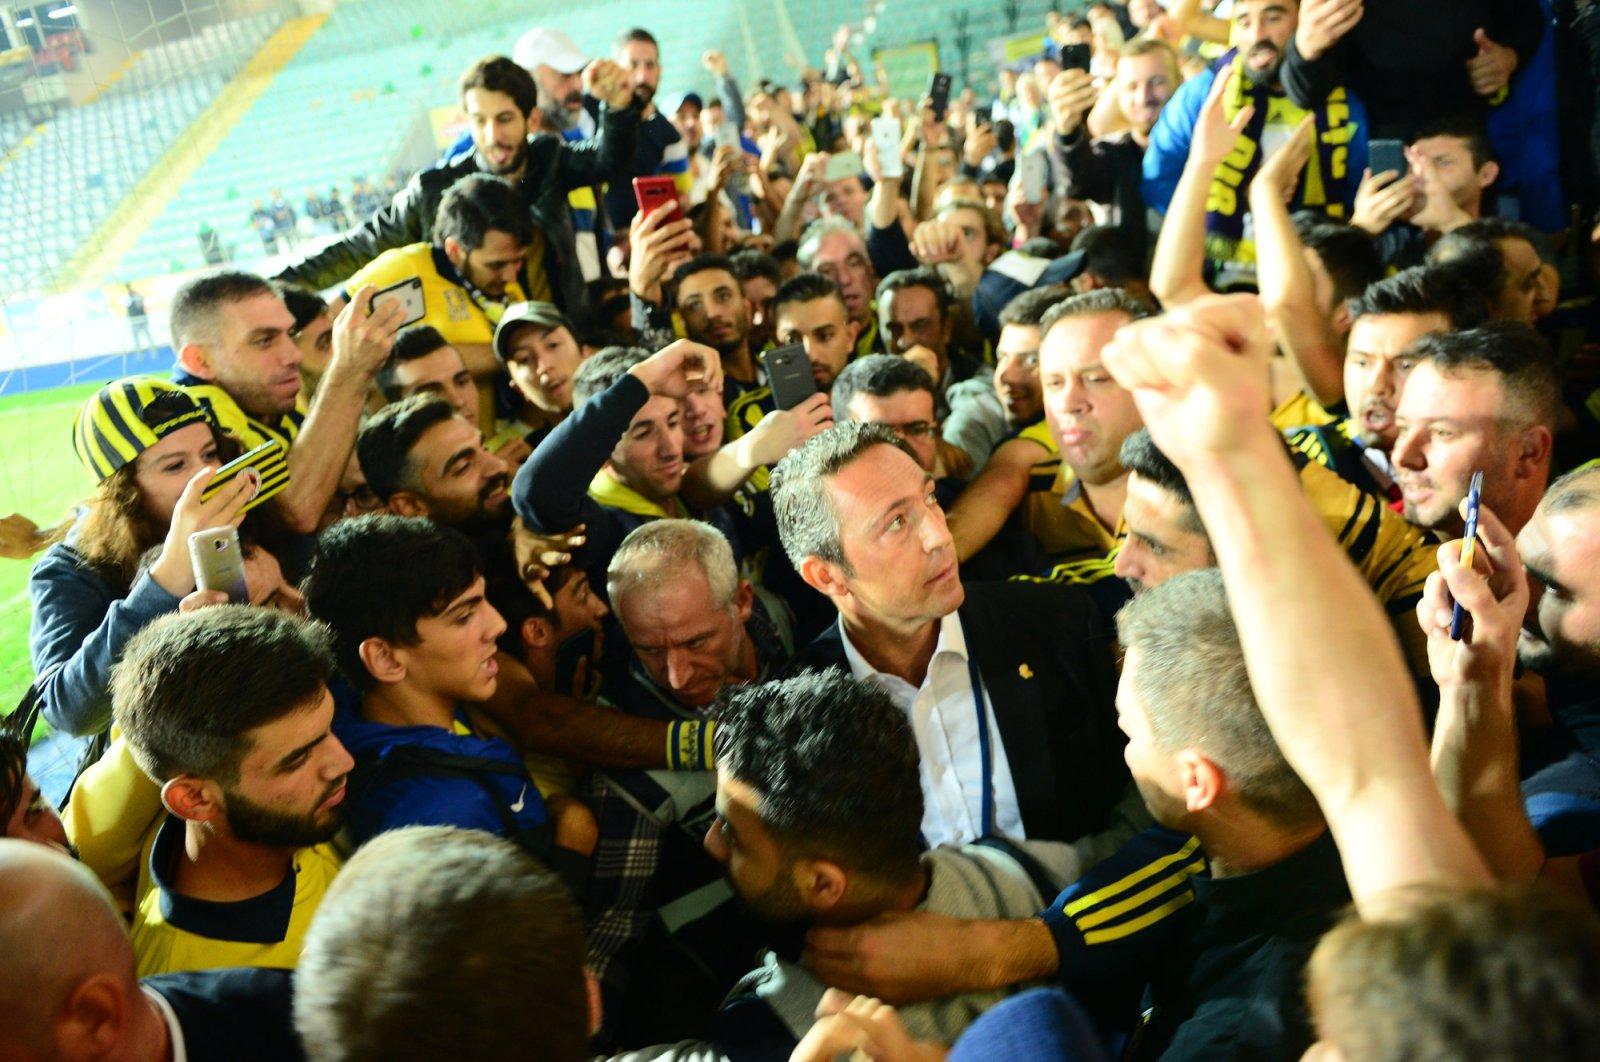 Fenerbahçe Chairman Ali Koç surrounded by the club's fans during a Süper Lig match, Rize, northern Turkey, Sept. 30, 2018. (OĞUZ YÖRÜK/Sabah Photo)